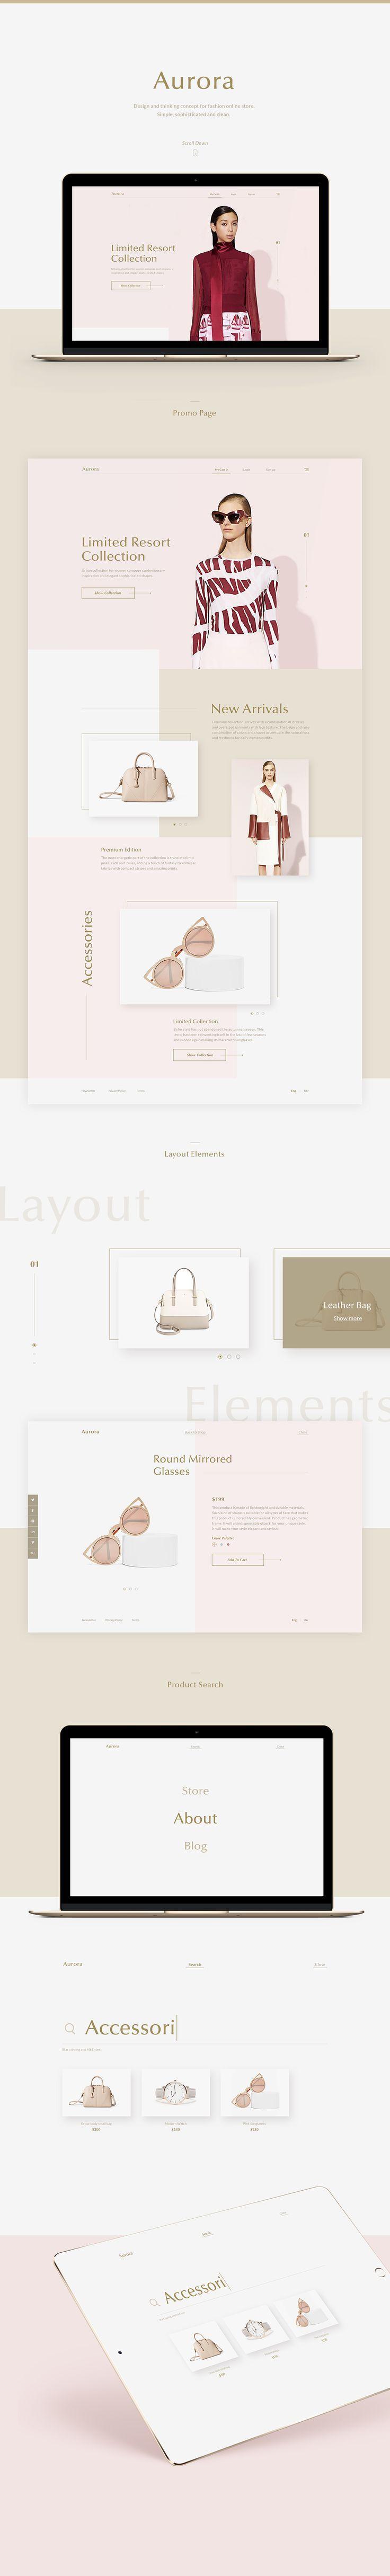 Aurora on Web Design Served                                                                                                                                                     More